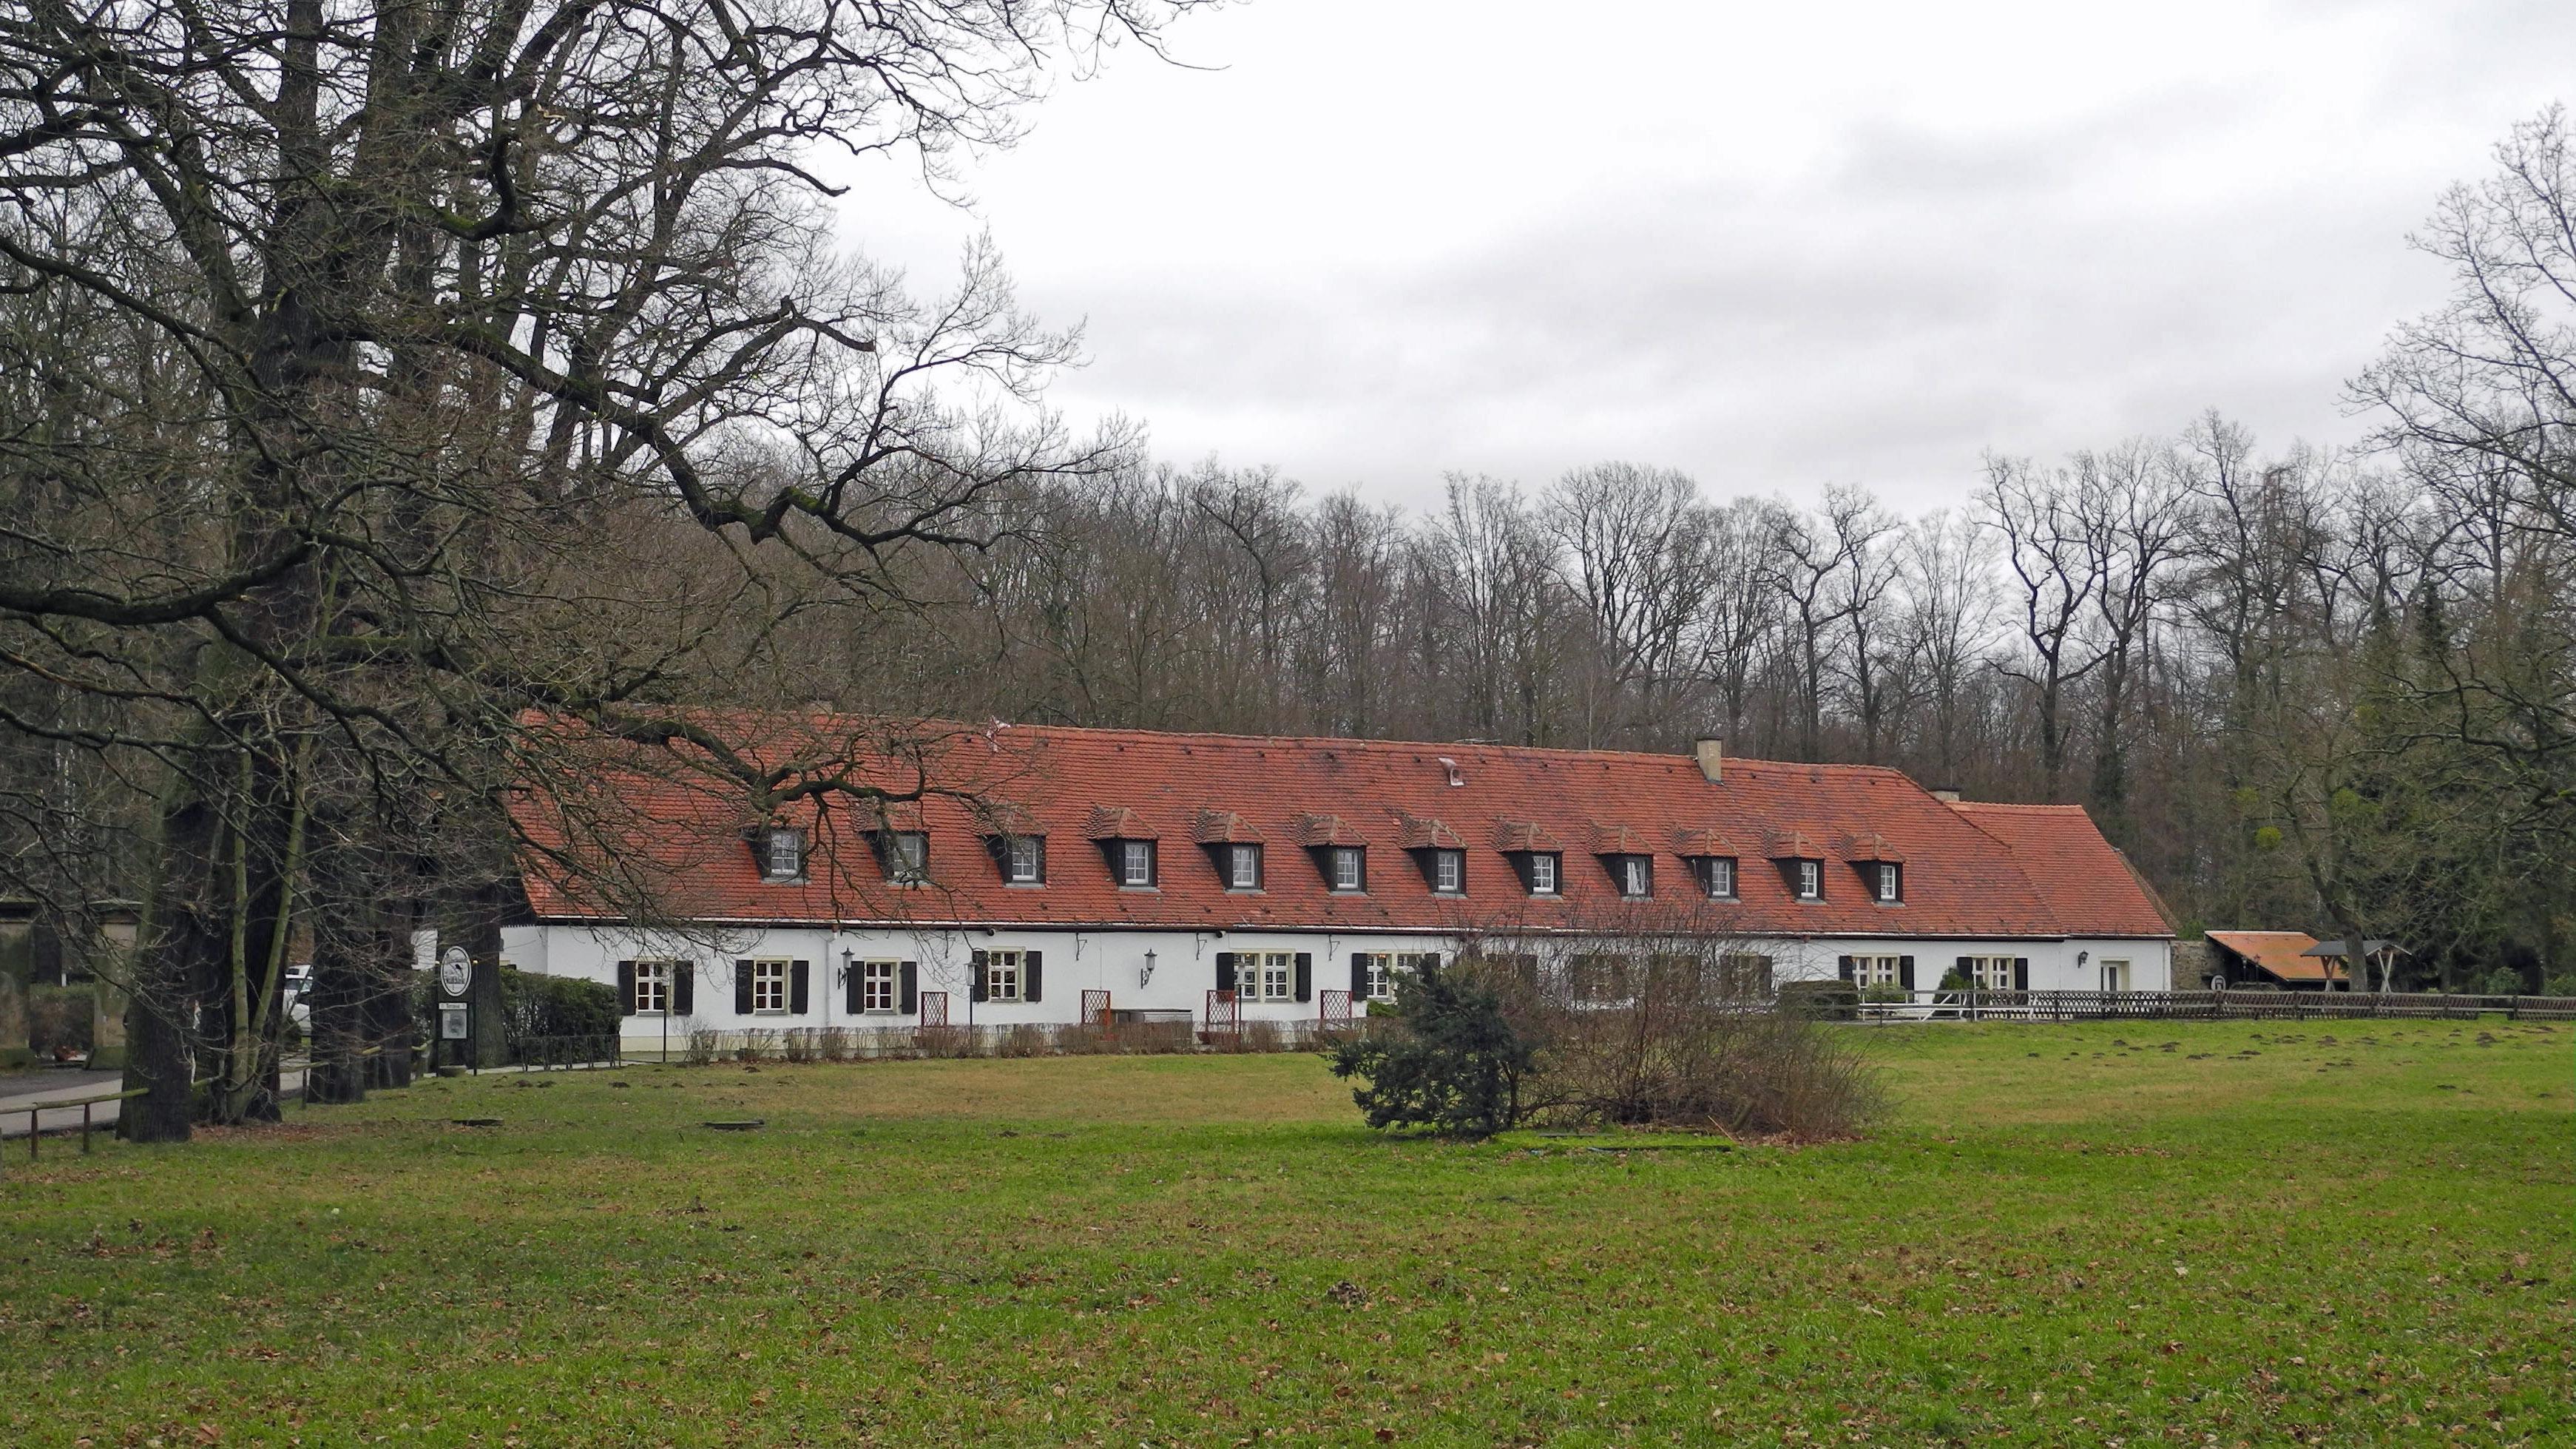 File:Moritzburg-Waldschänke-3.jpg - Wikimedia Commons